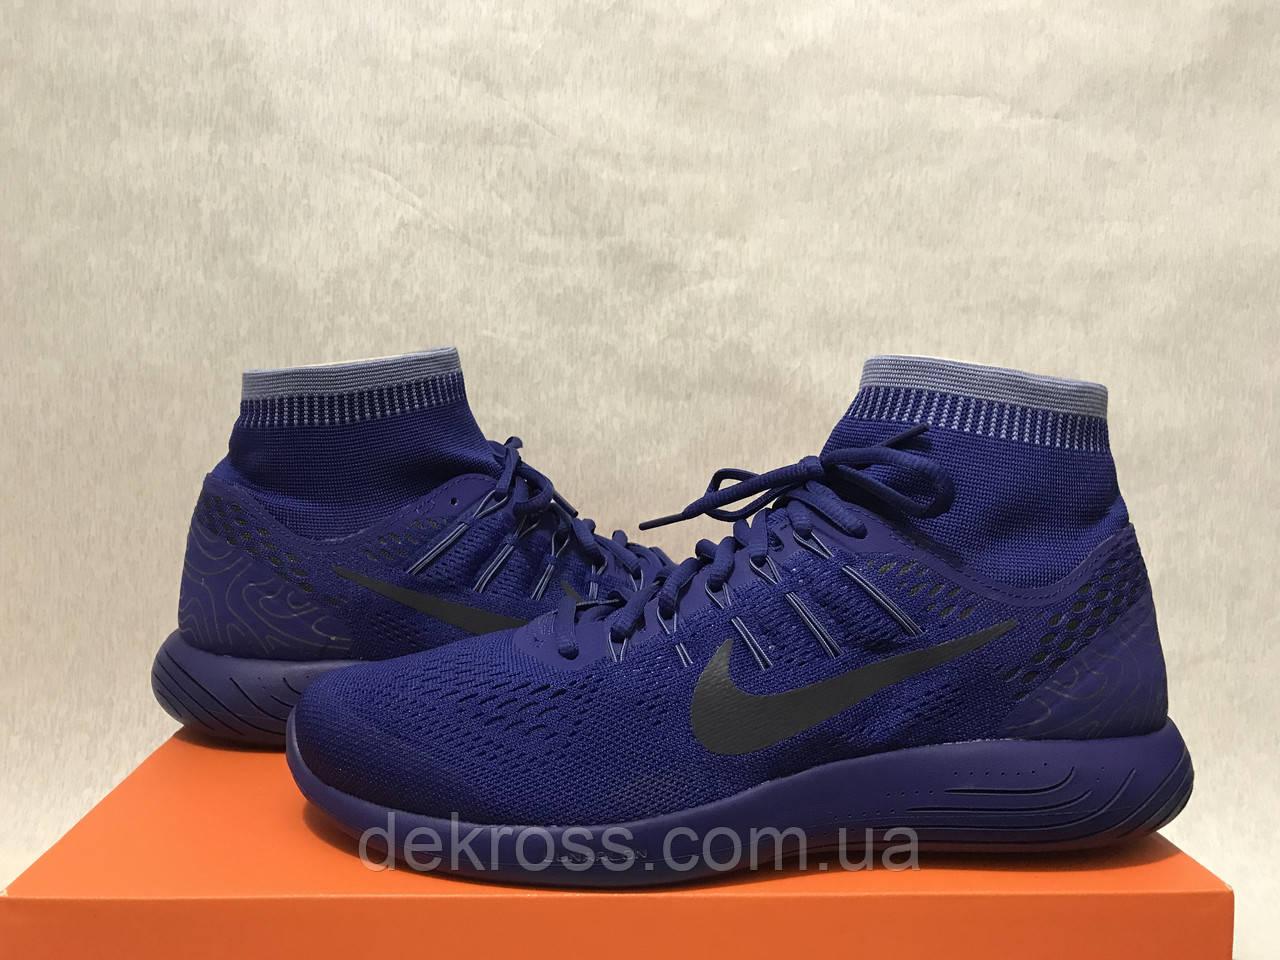 Бігові кросівки Nike LunarGlide 8 (44-45) Оригінал 898807-444